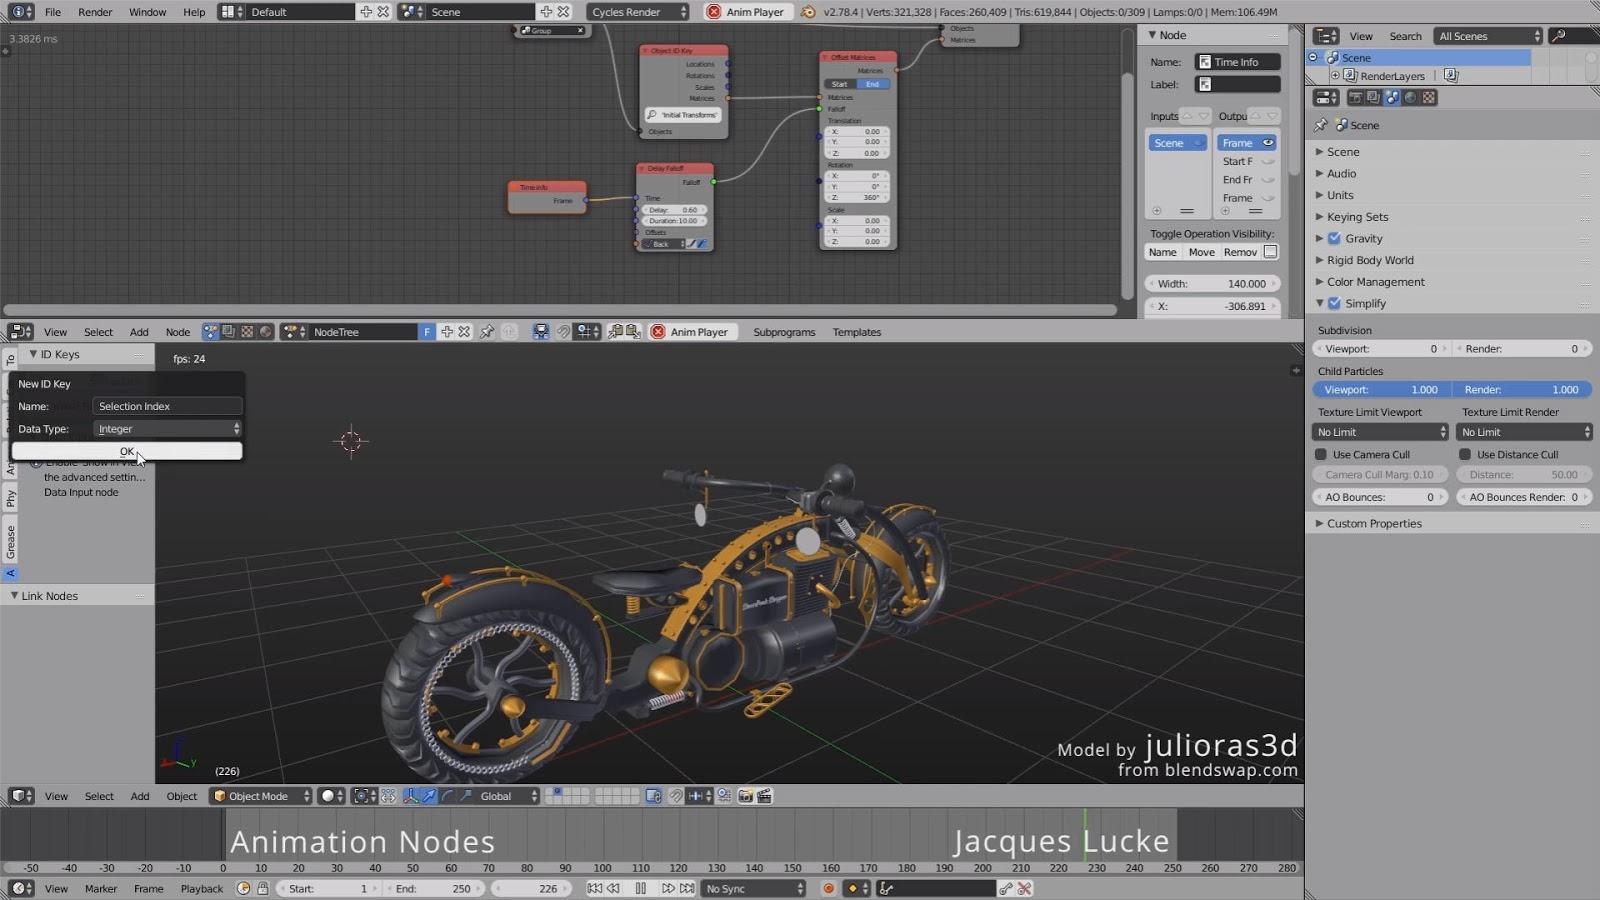 Download Animation Nodes 2 0 for Blender - Plugins Reviews and